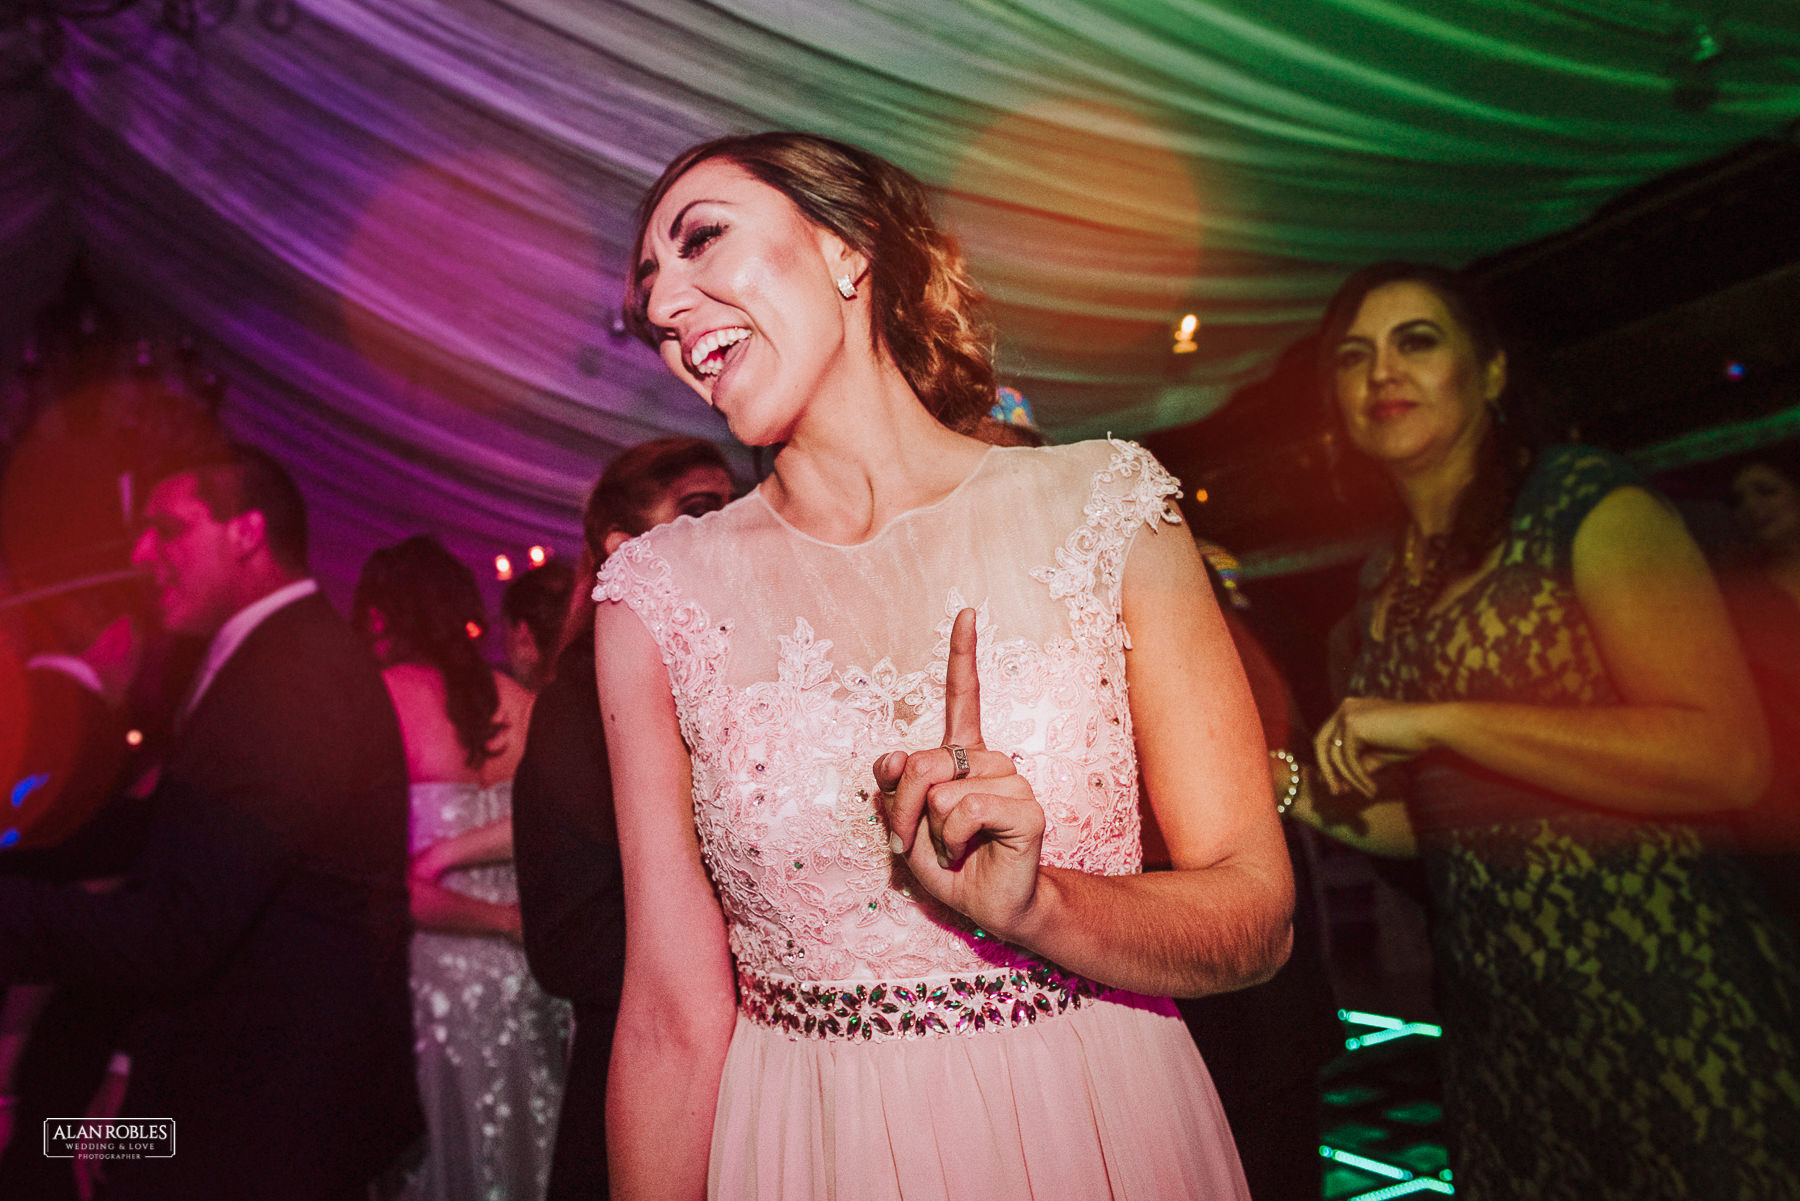 Alan Robles fotografo de bodas guadalajara - LyP Hotel Demetria-70